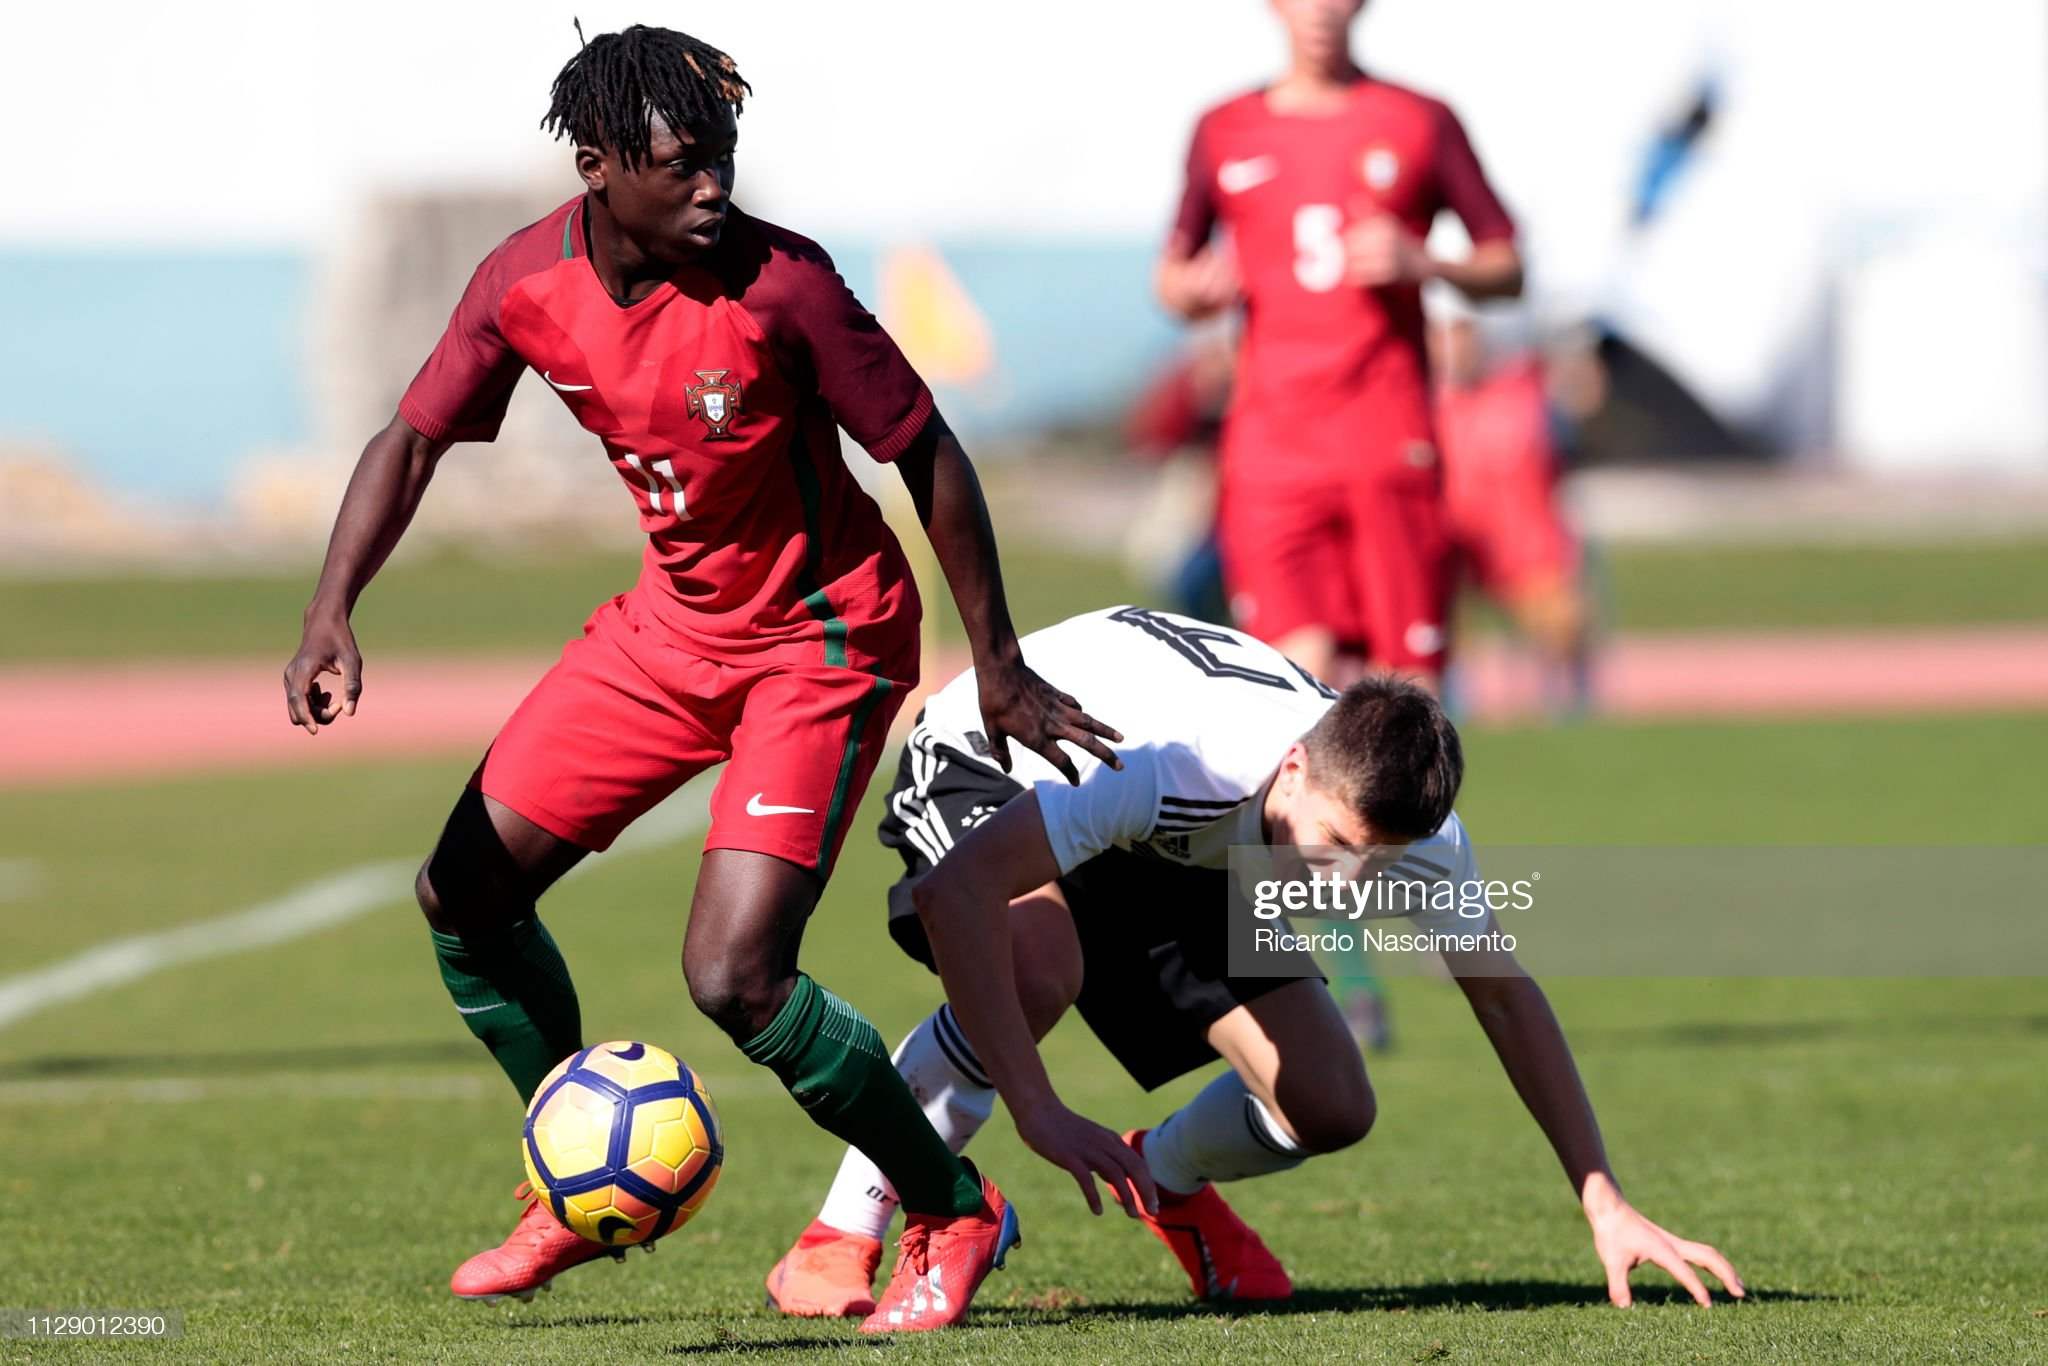 U16 Germany v U16 Portugal - UEFA Development Tournament : News Photo